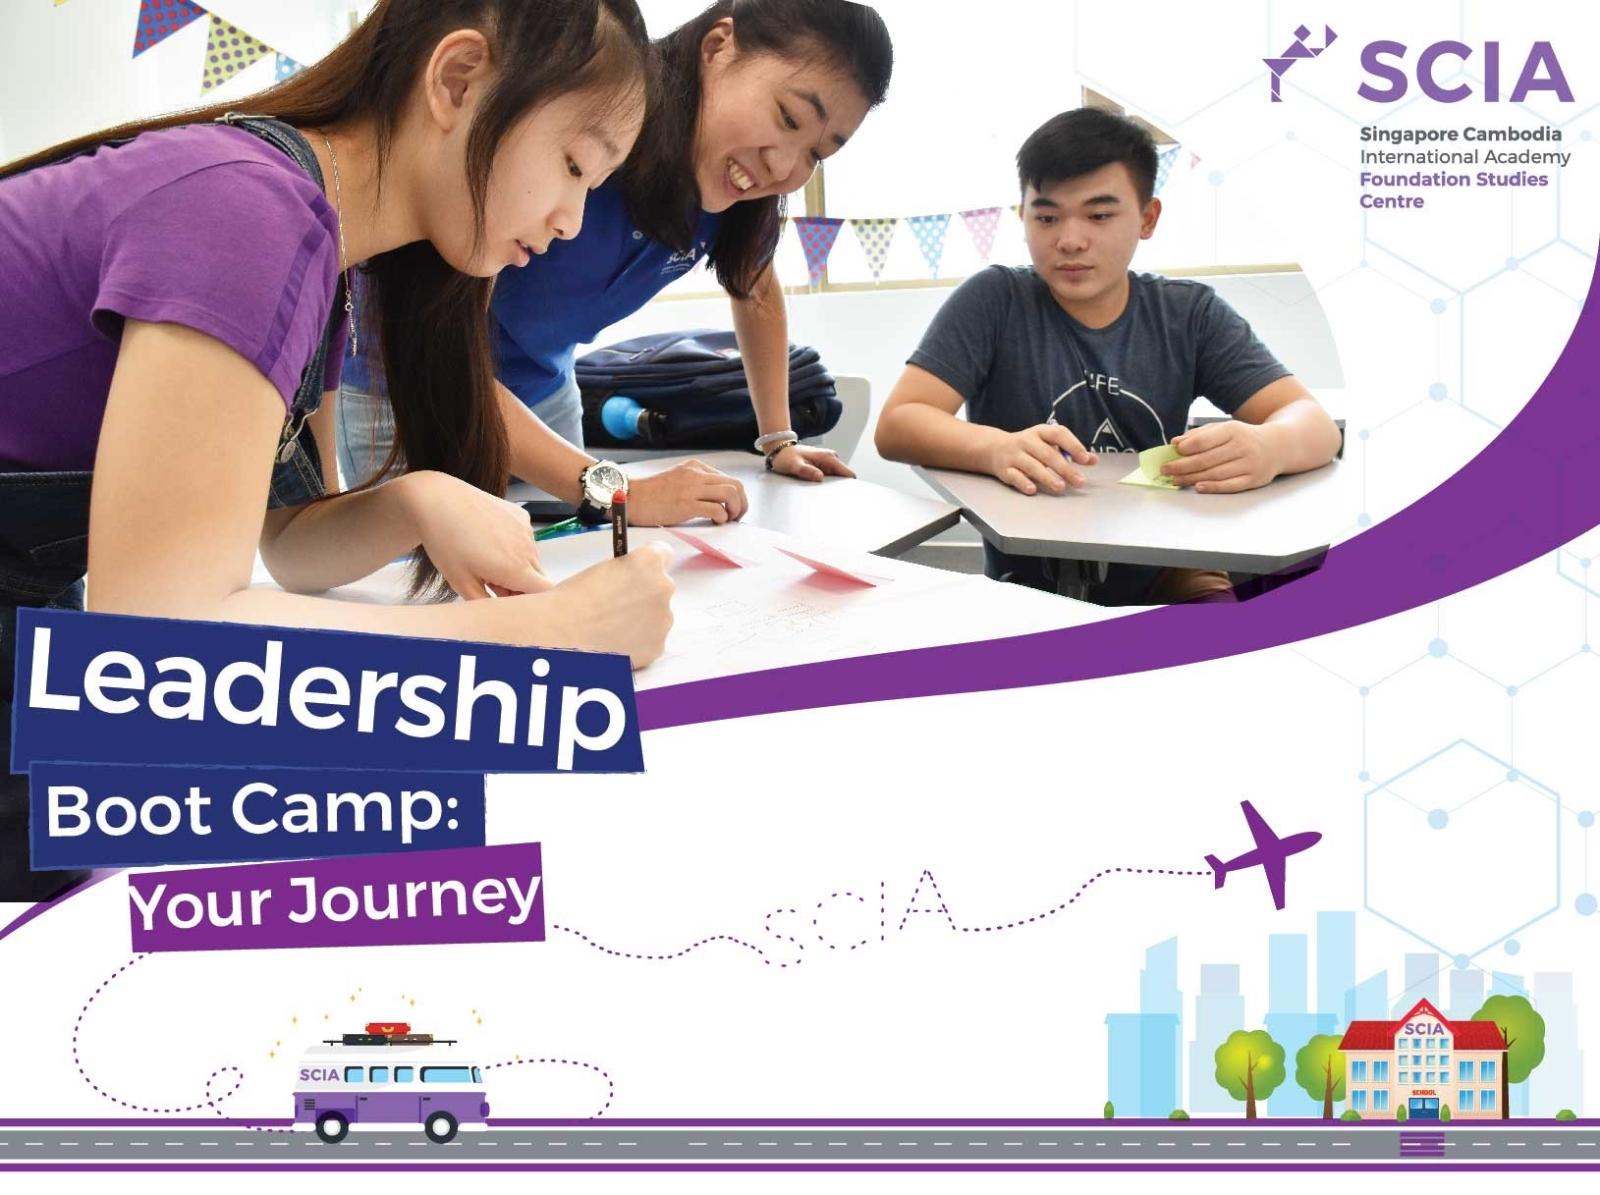 SCIA Leadership bootcamp